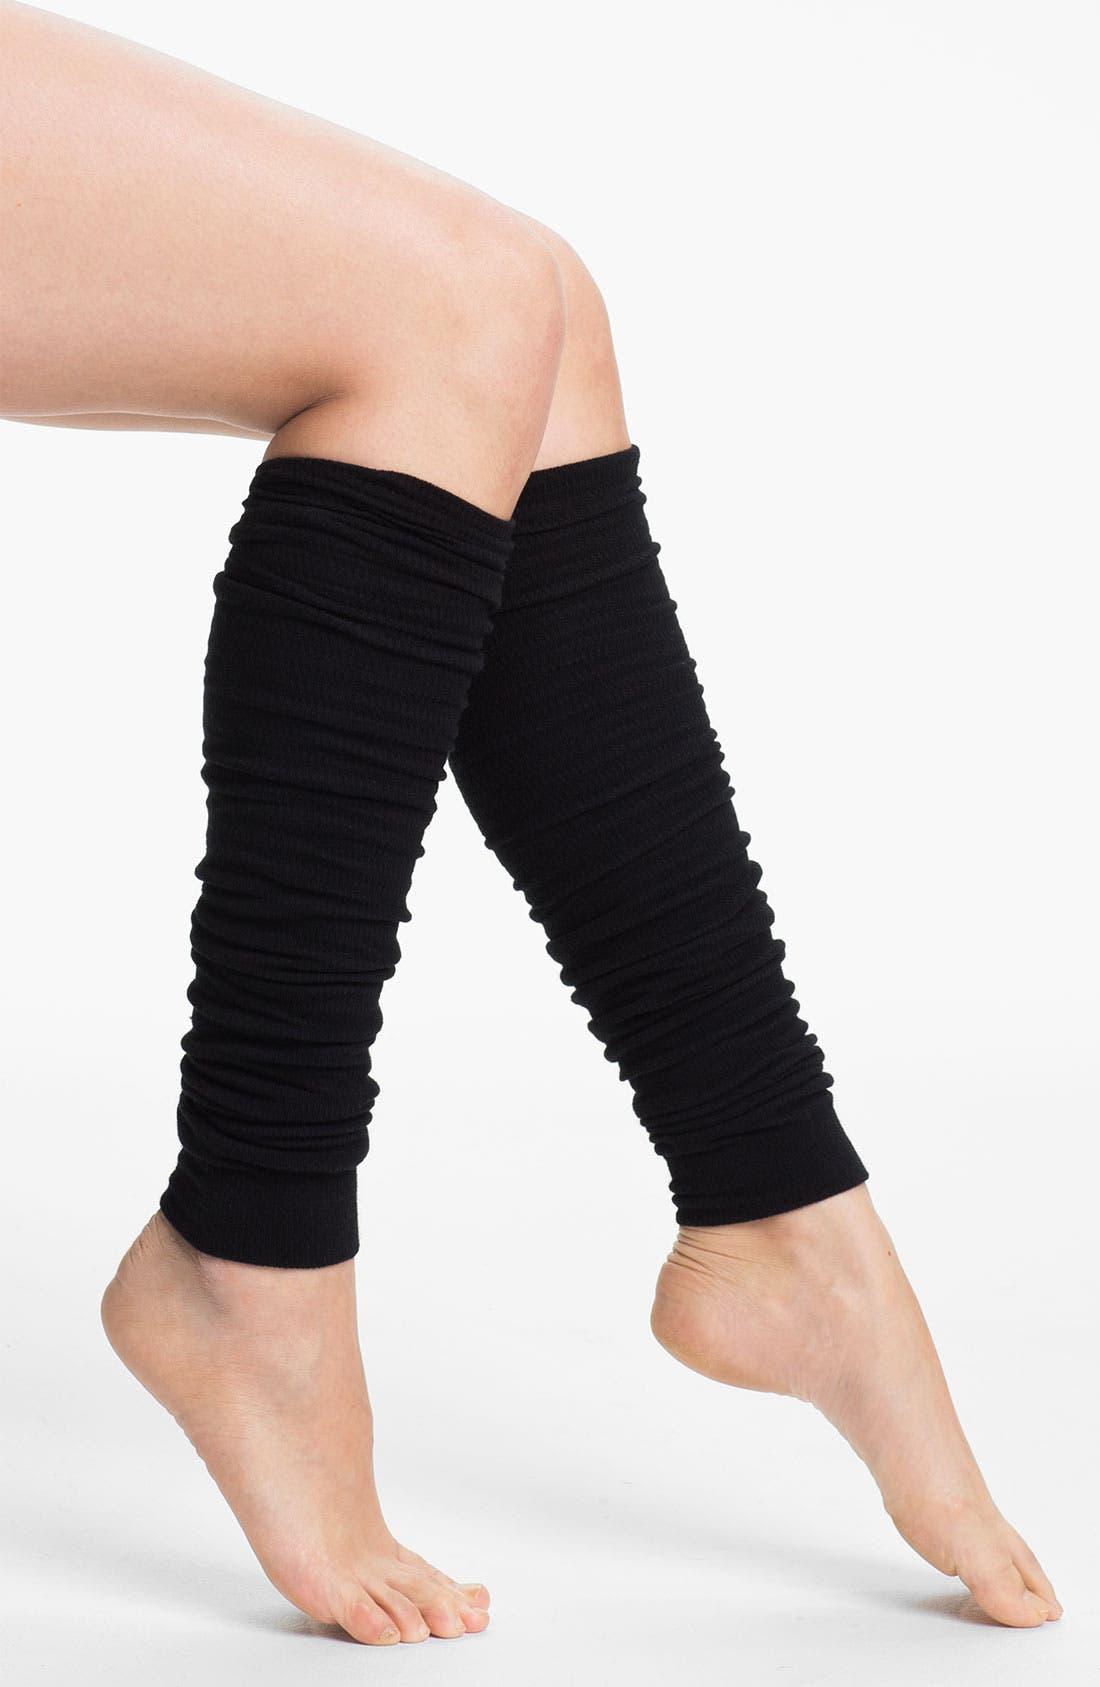 UNIT-Y, 'Fancy Feet' Leg Warmers, Main thumbnail 1, color, 001